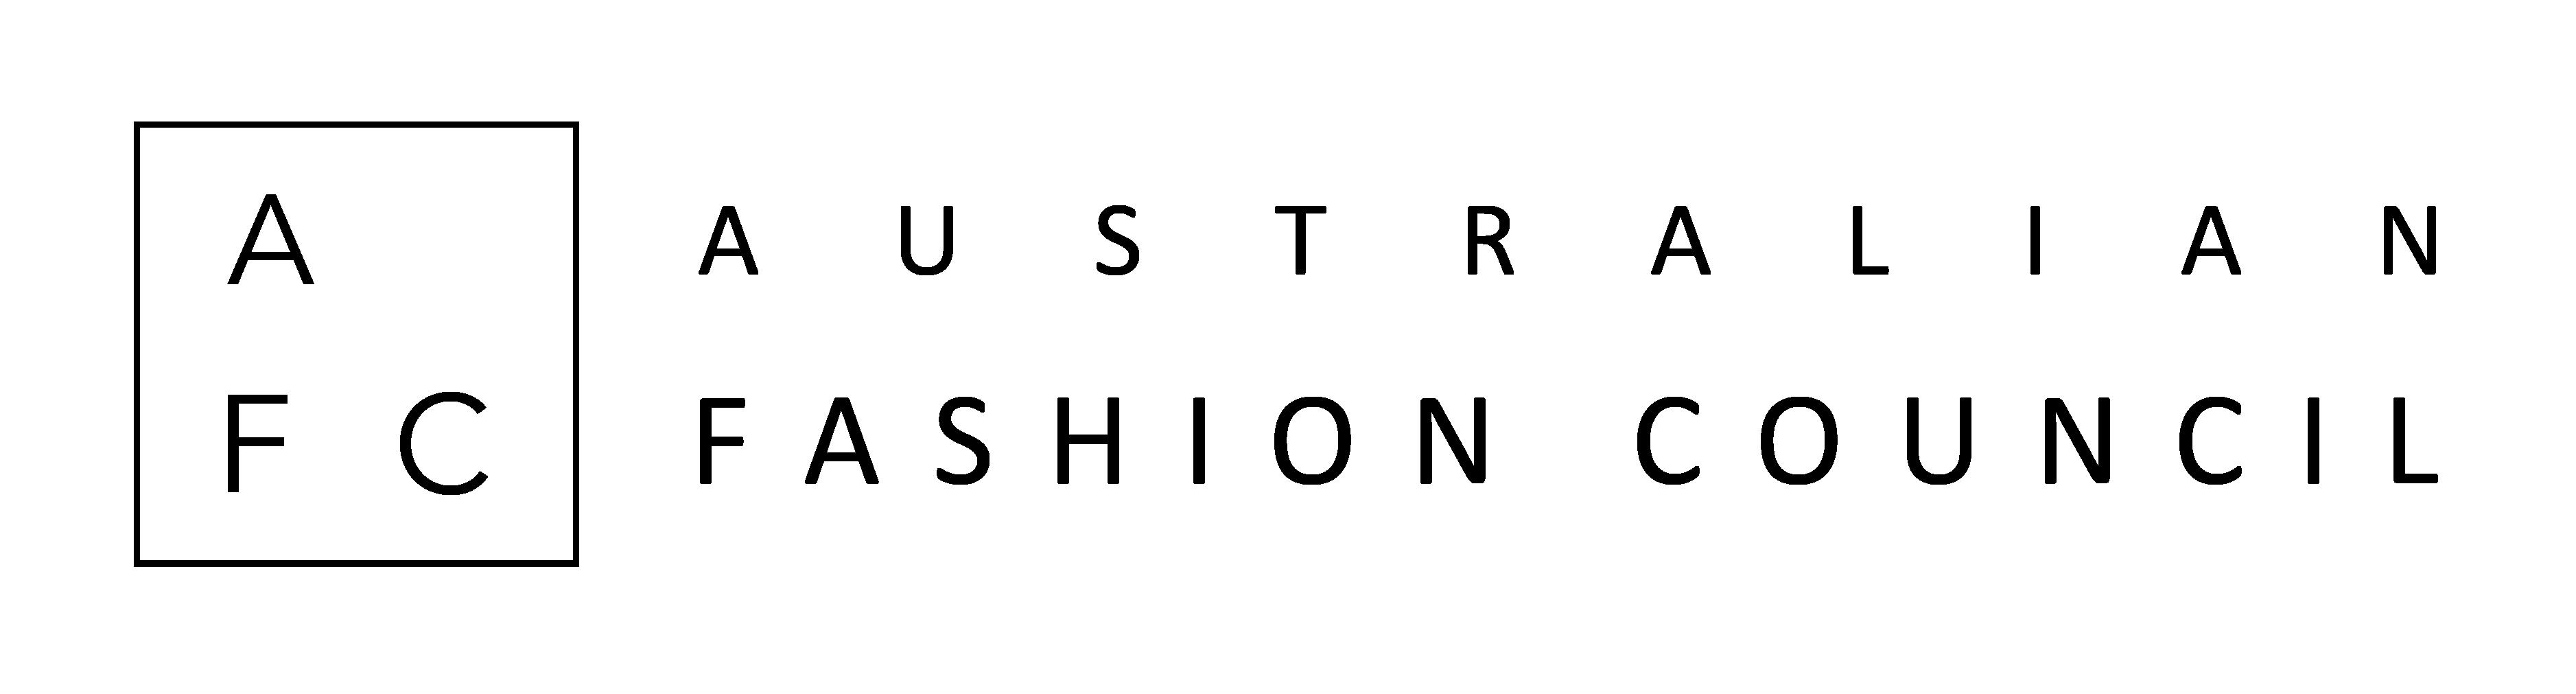 AFC TextAndSquare Horizontal Black Transparent - Building a Global Brand